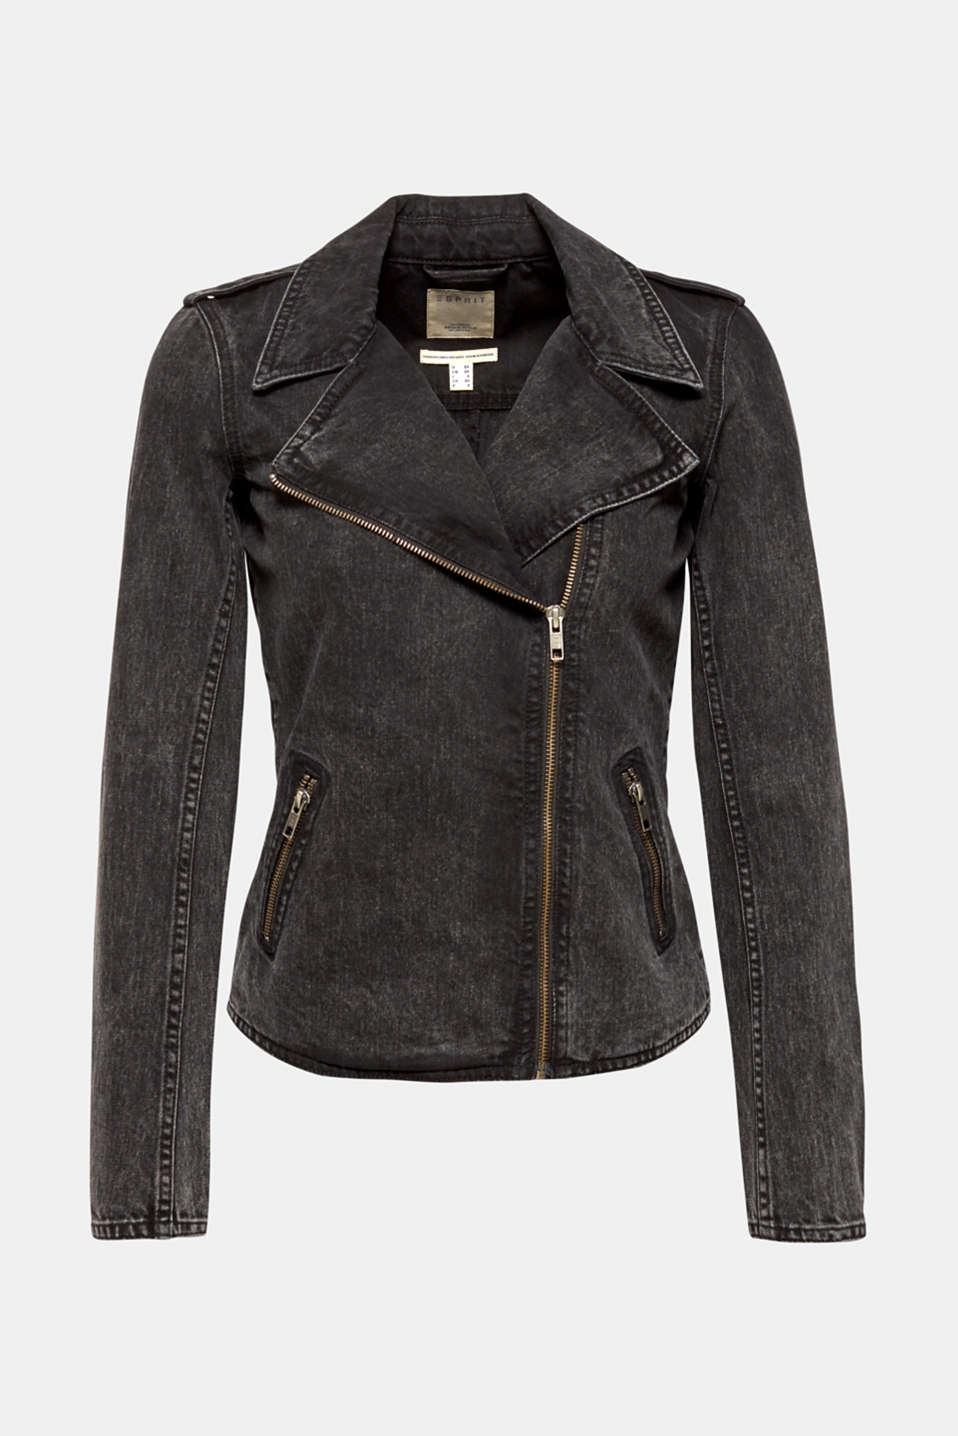 Jackets indoor denim, GREY DARK WASH, detail image number 8